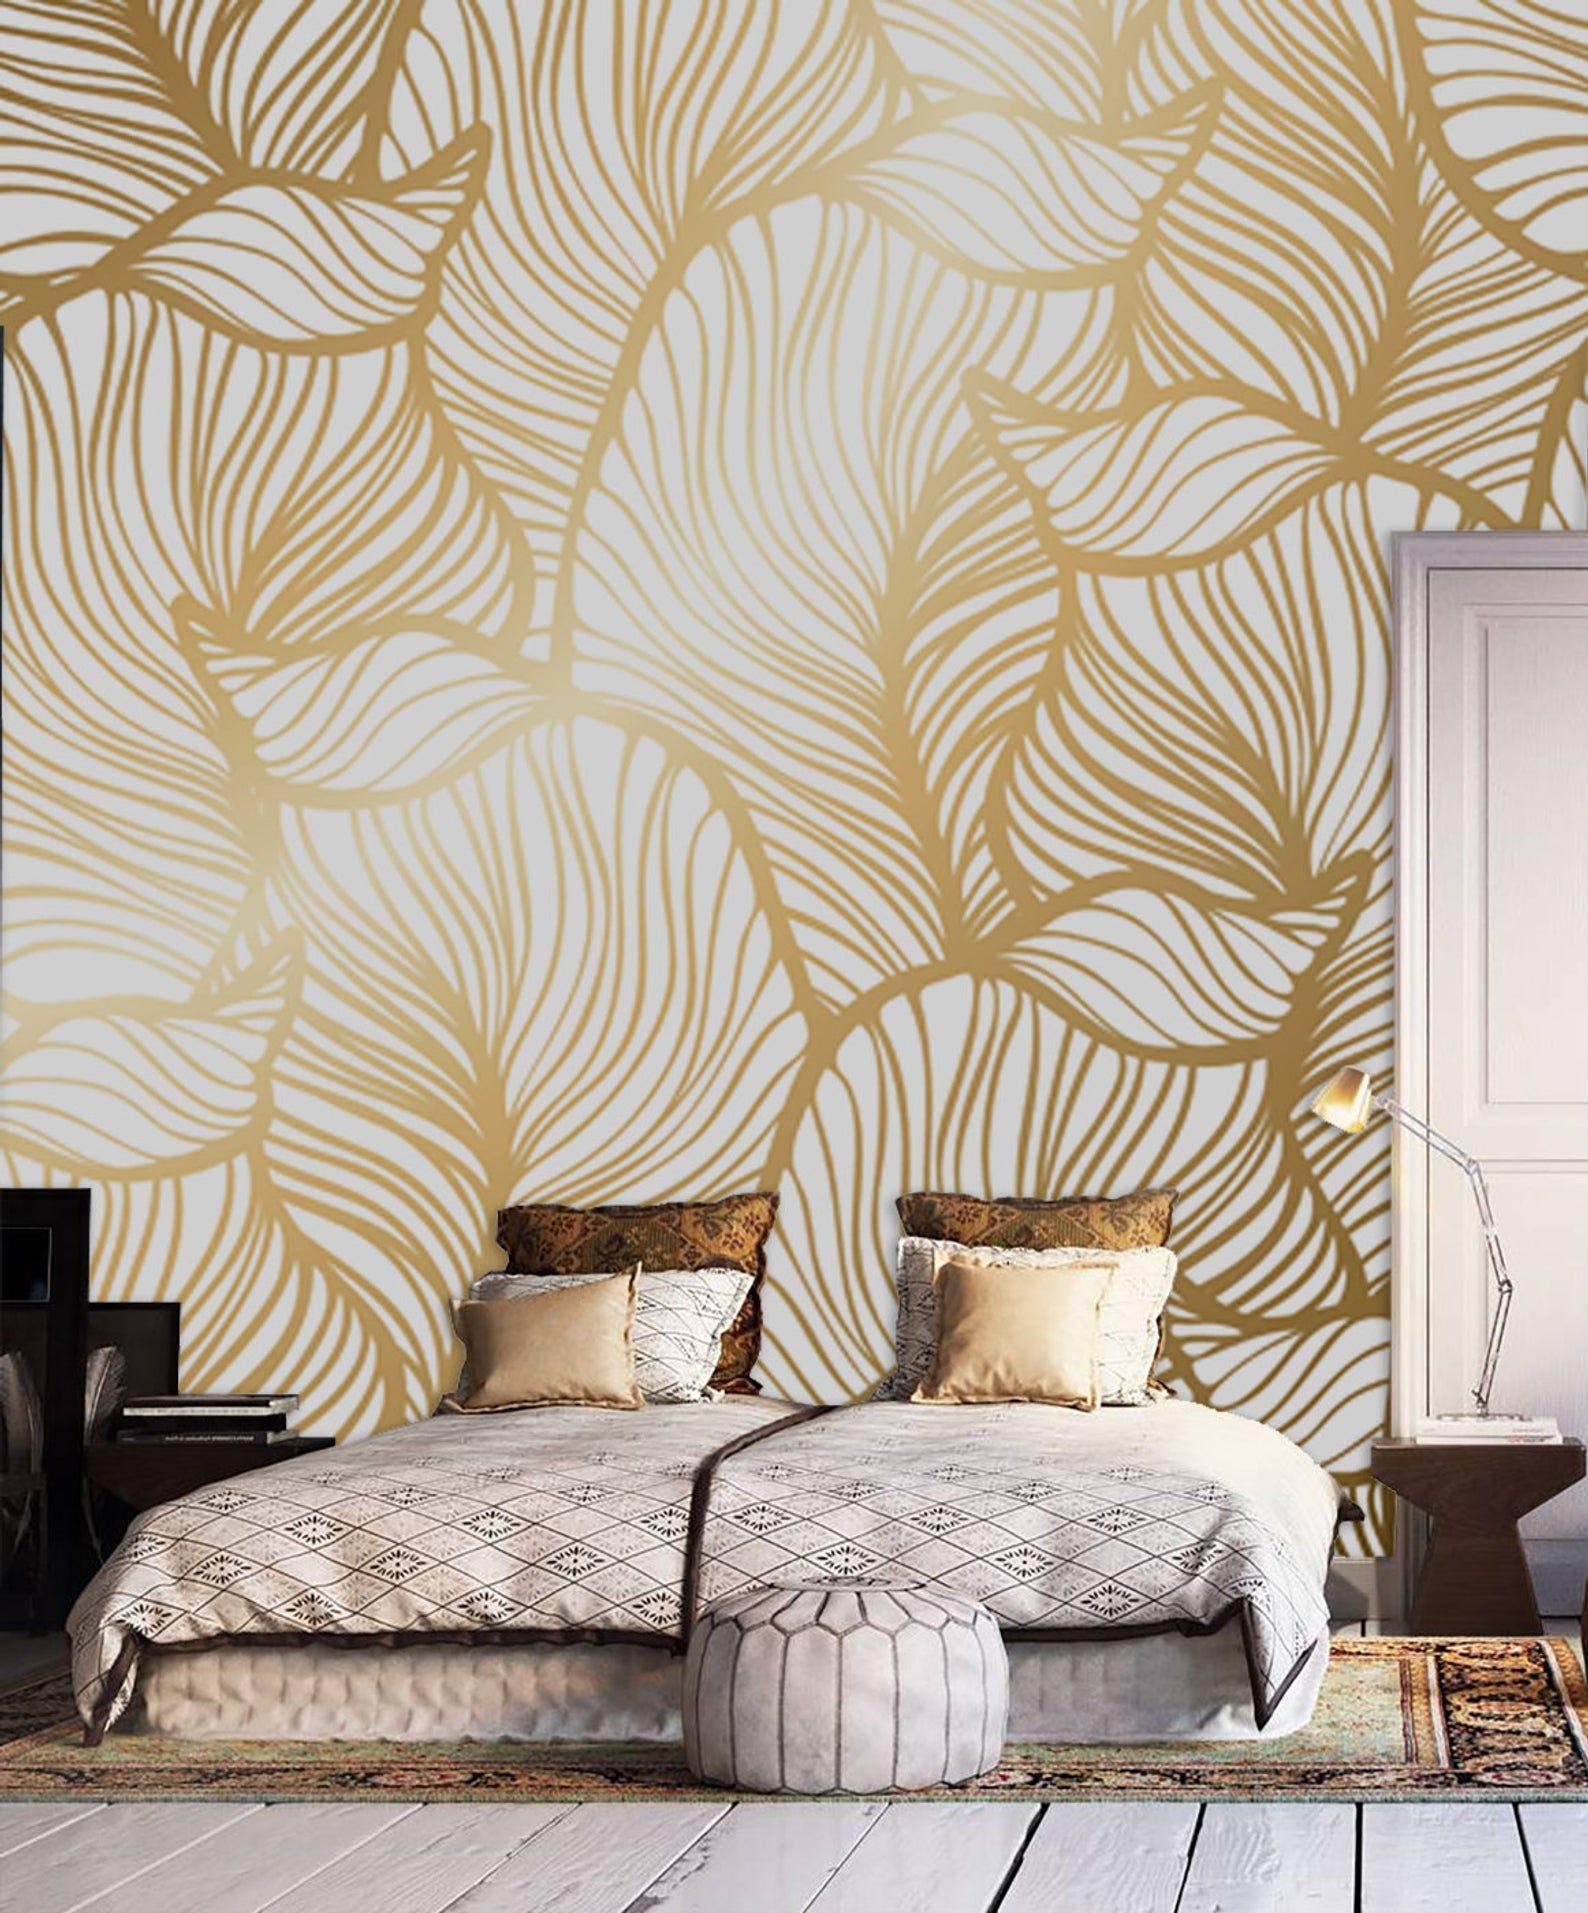 Leaf Wallpaper Print Painting Home Decor Wall Decal Etsy Leaf Wallpaper Home Decor Wallpaper Walls Decor